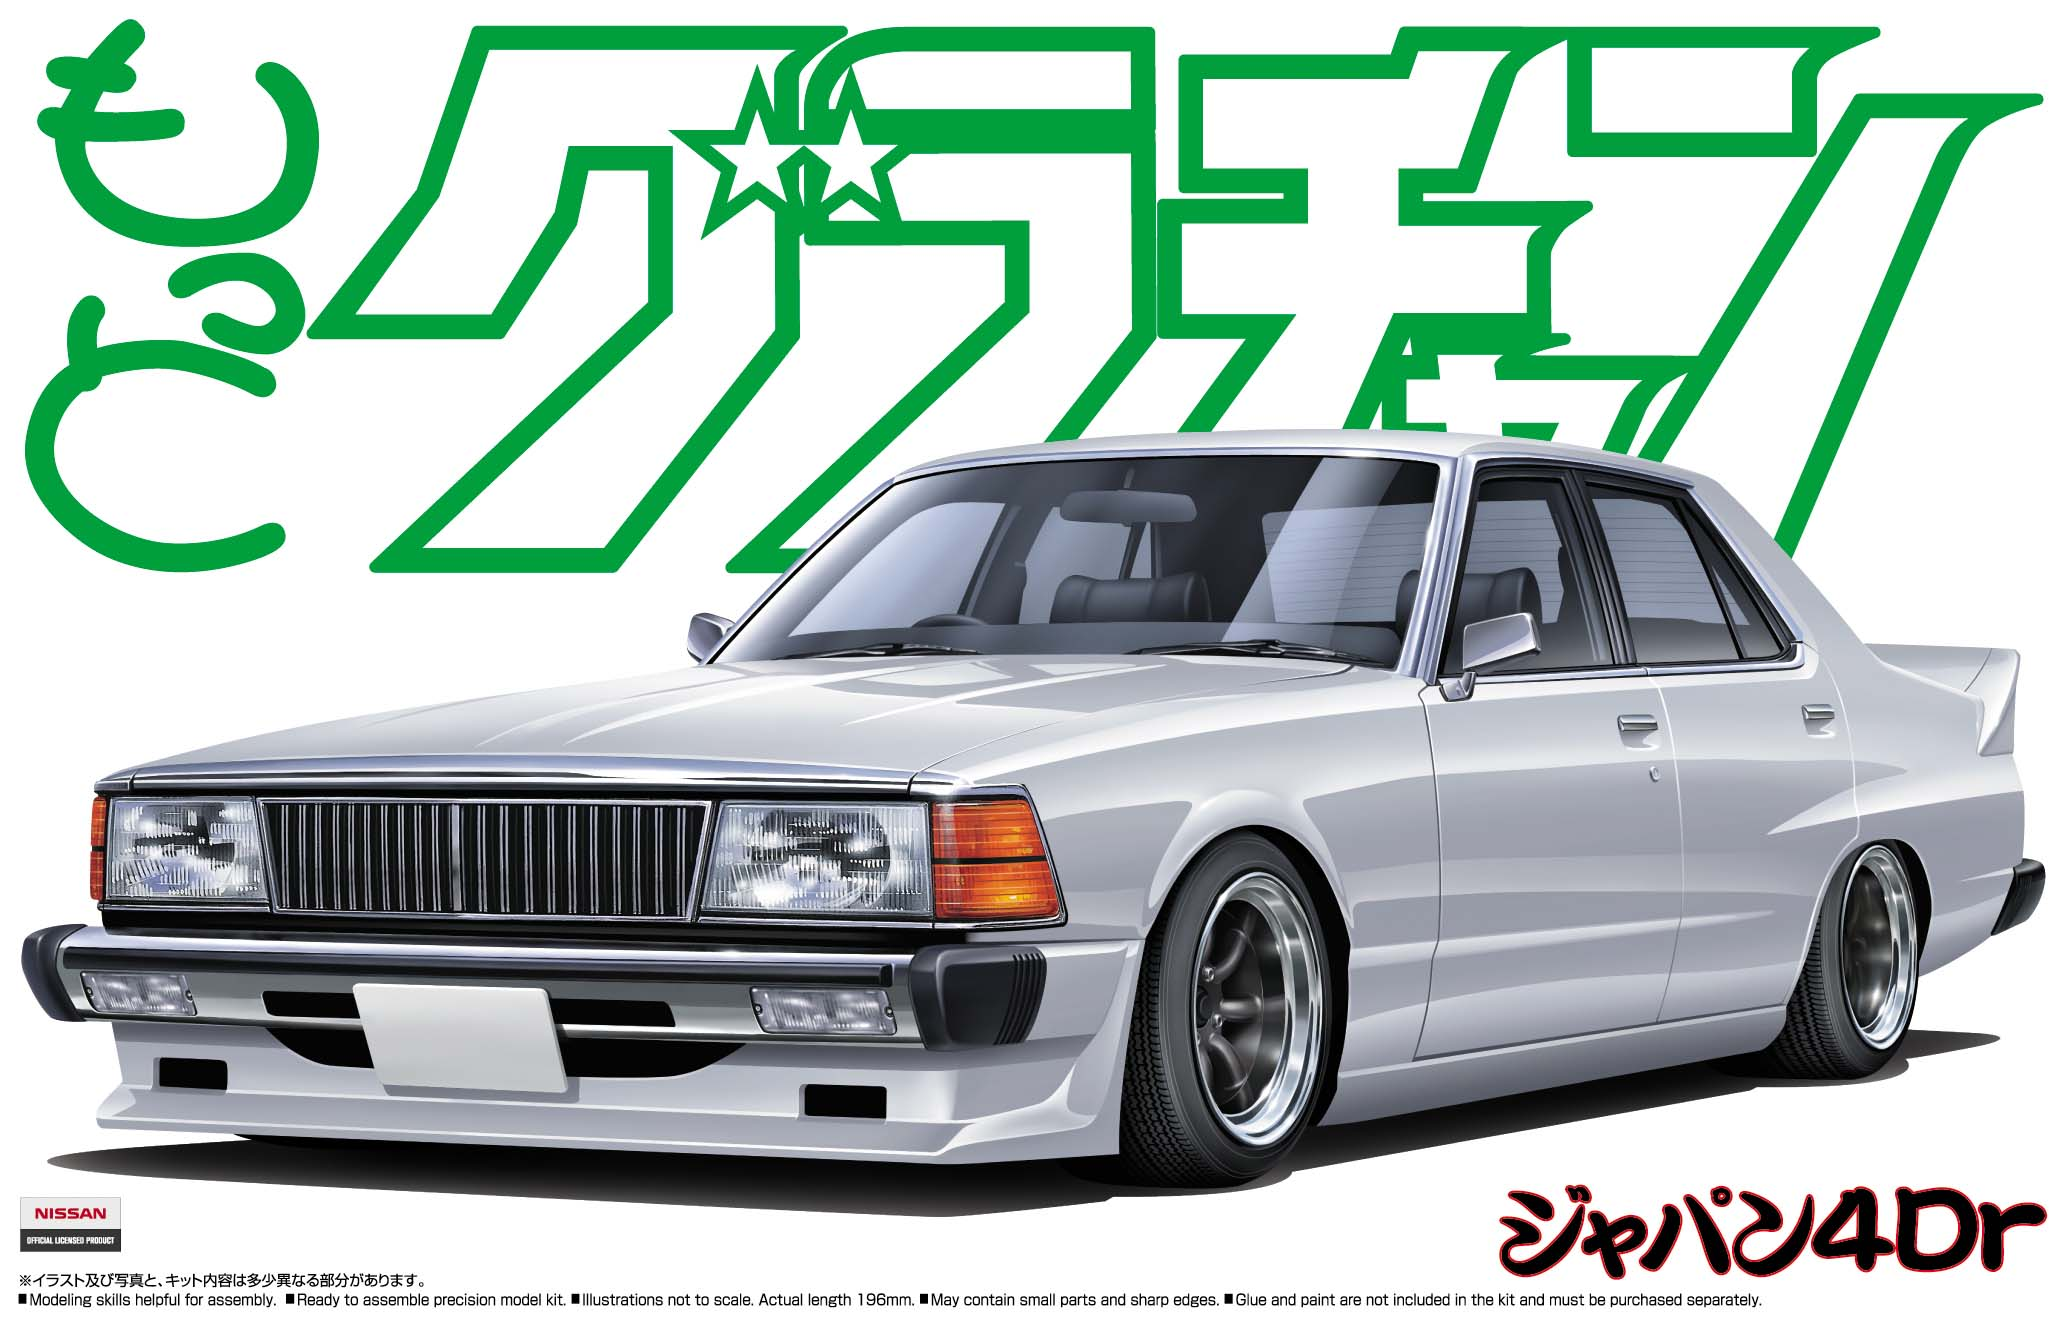 The beautiful Box Art and history of Aoshima model kits ...